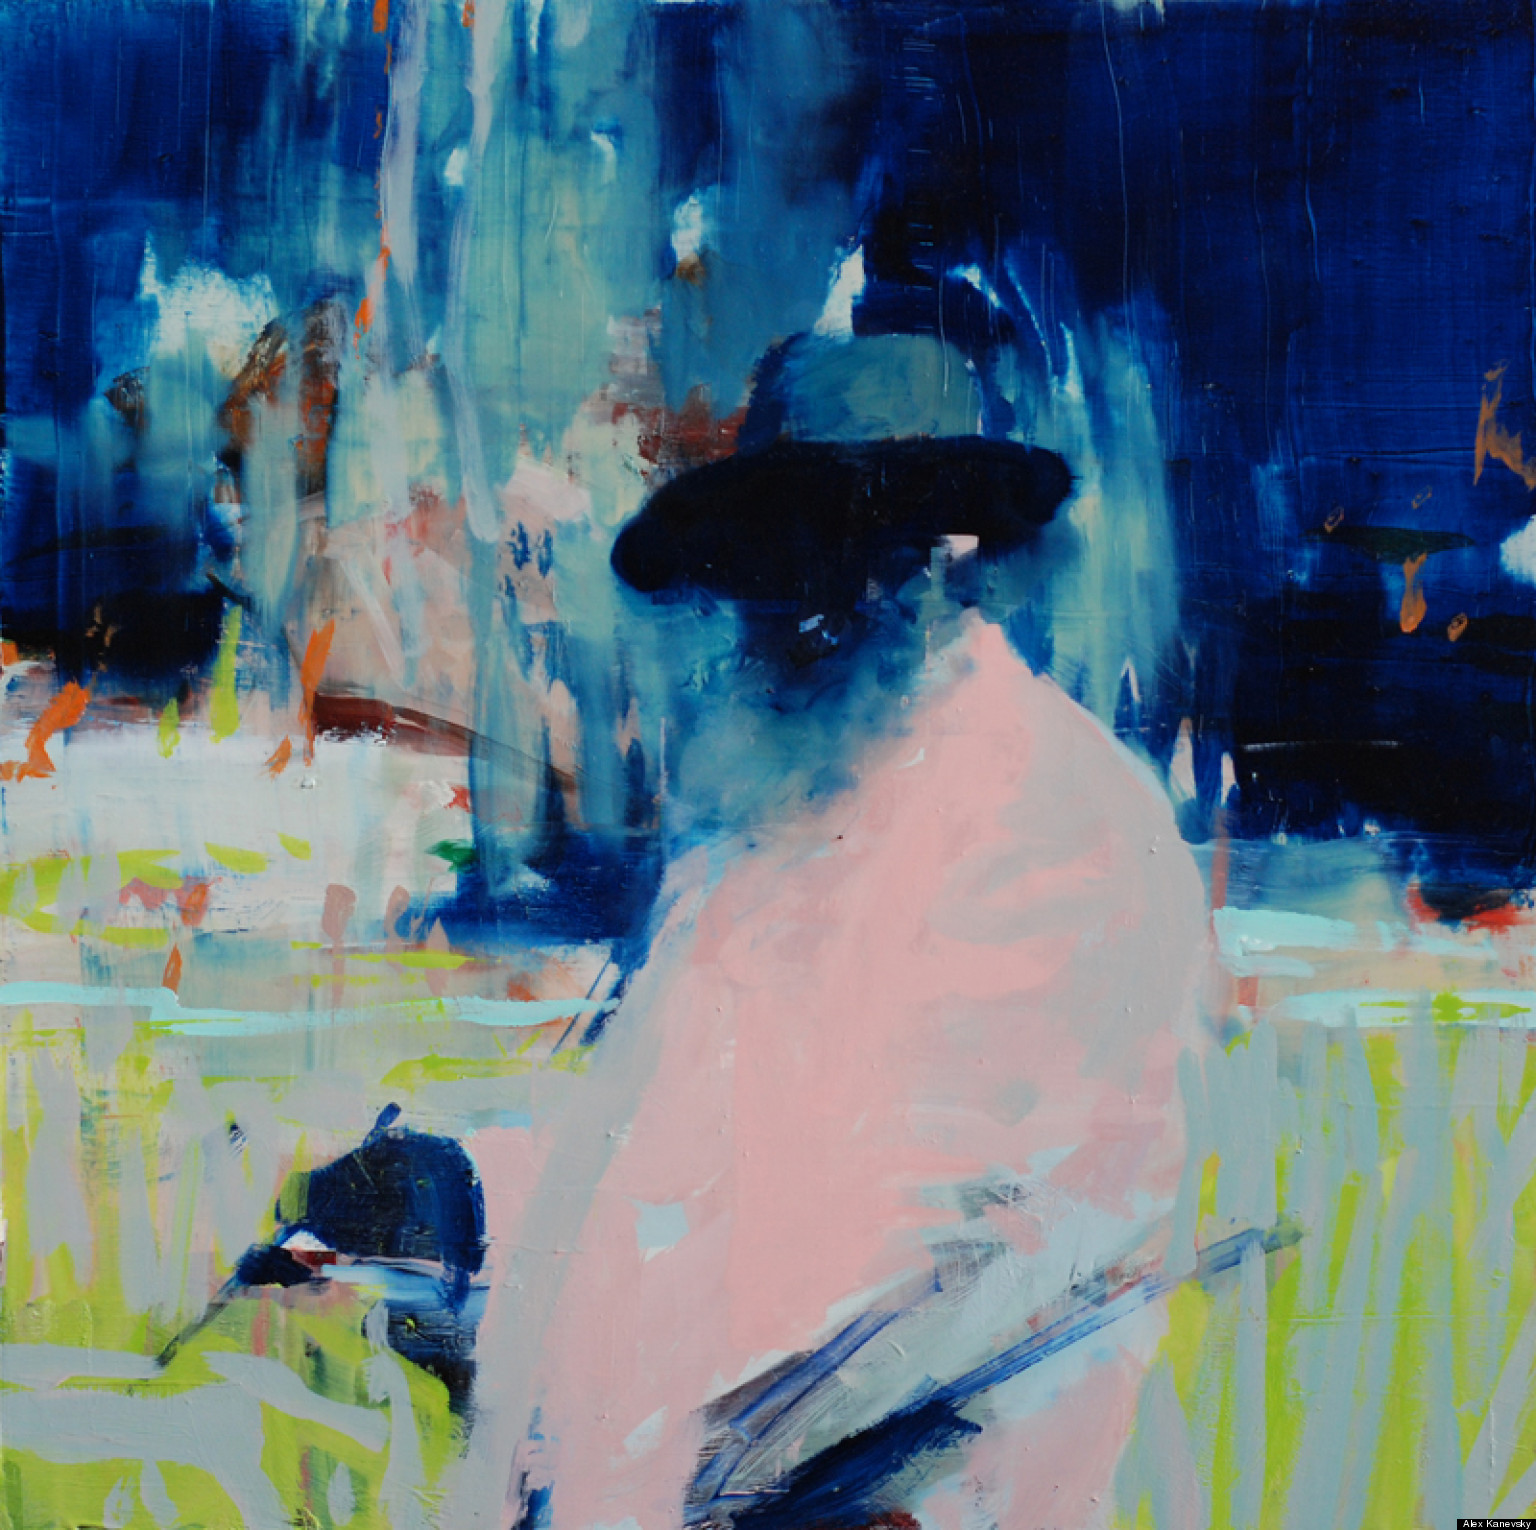 Garden Ridge Interview Questions: Alex Kanevsky Is 'On Our Radar': Philadelphia Painter